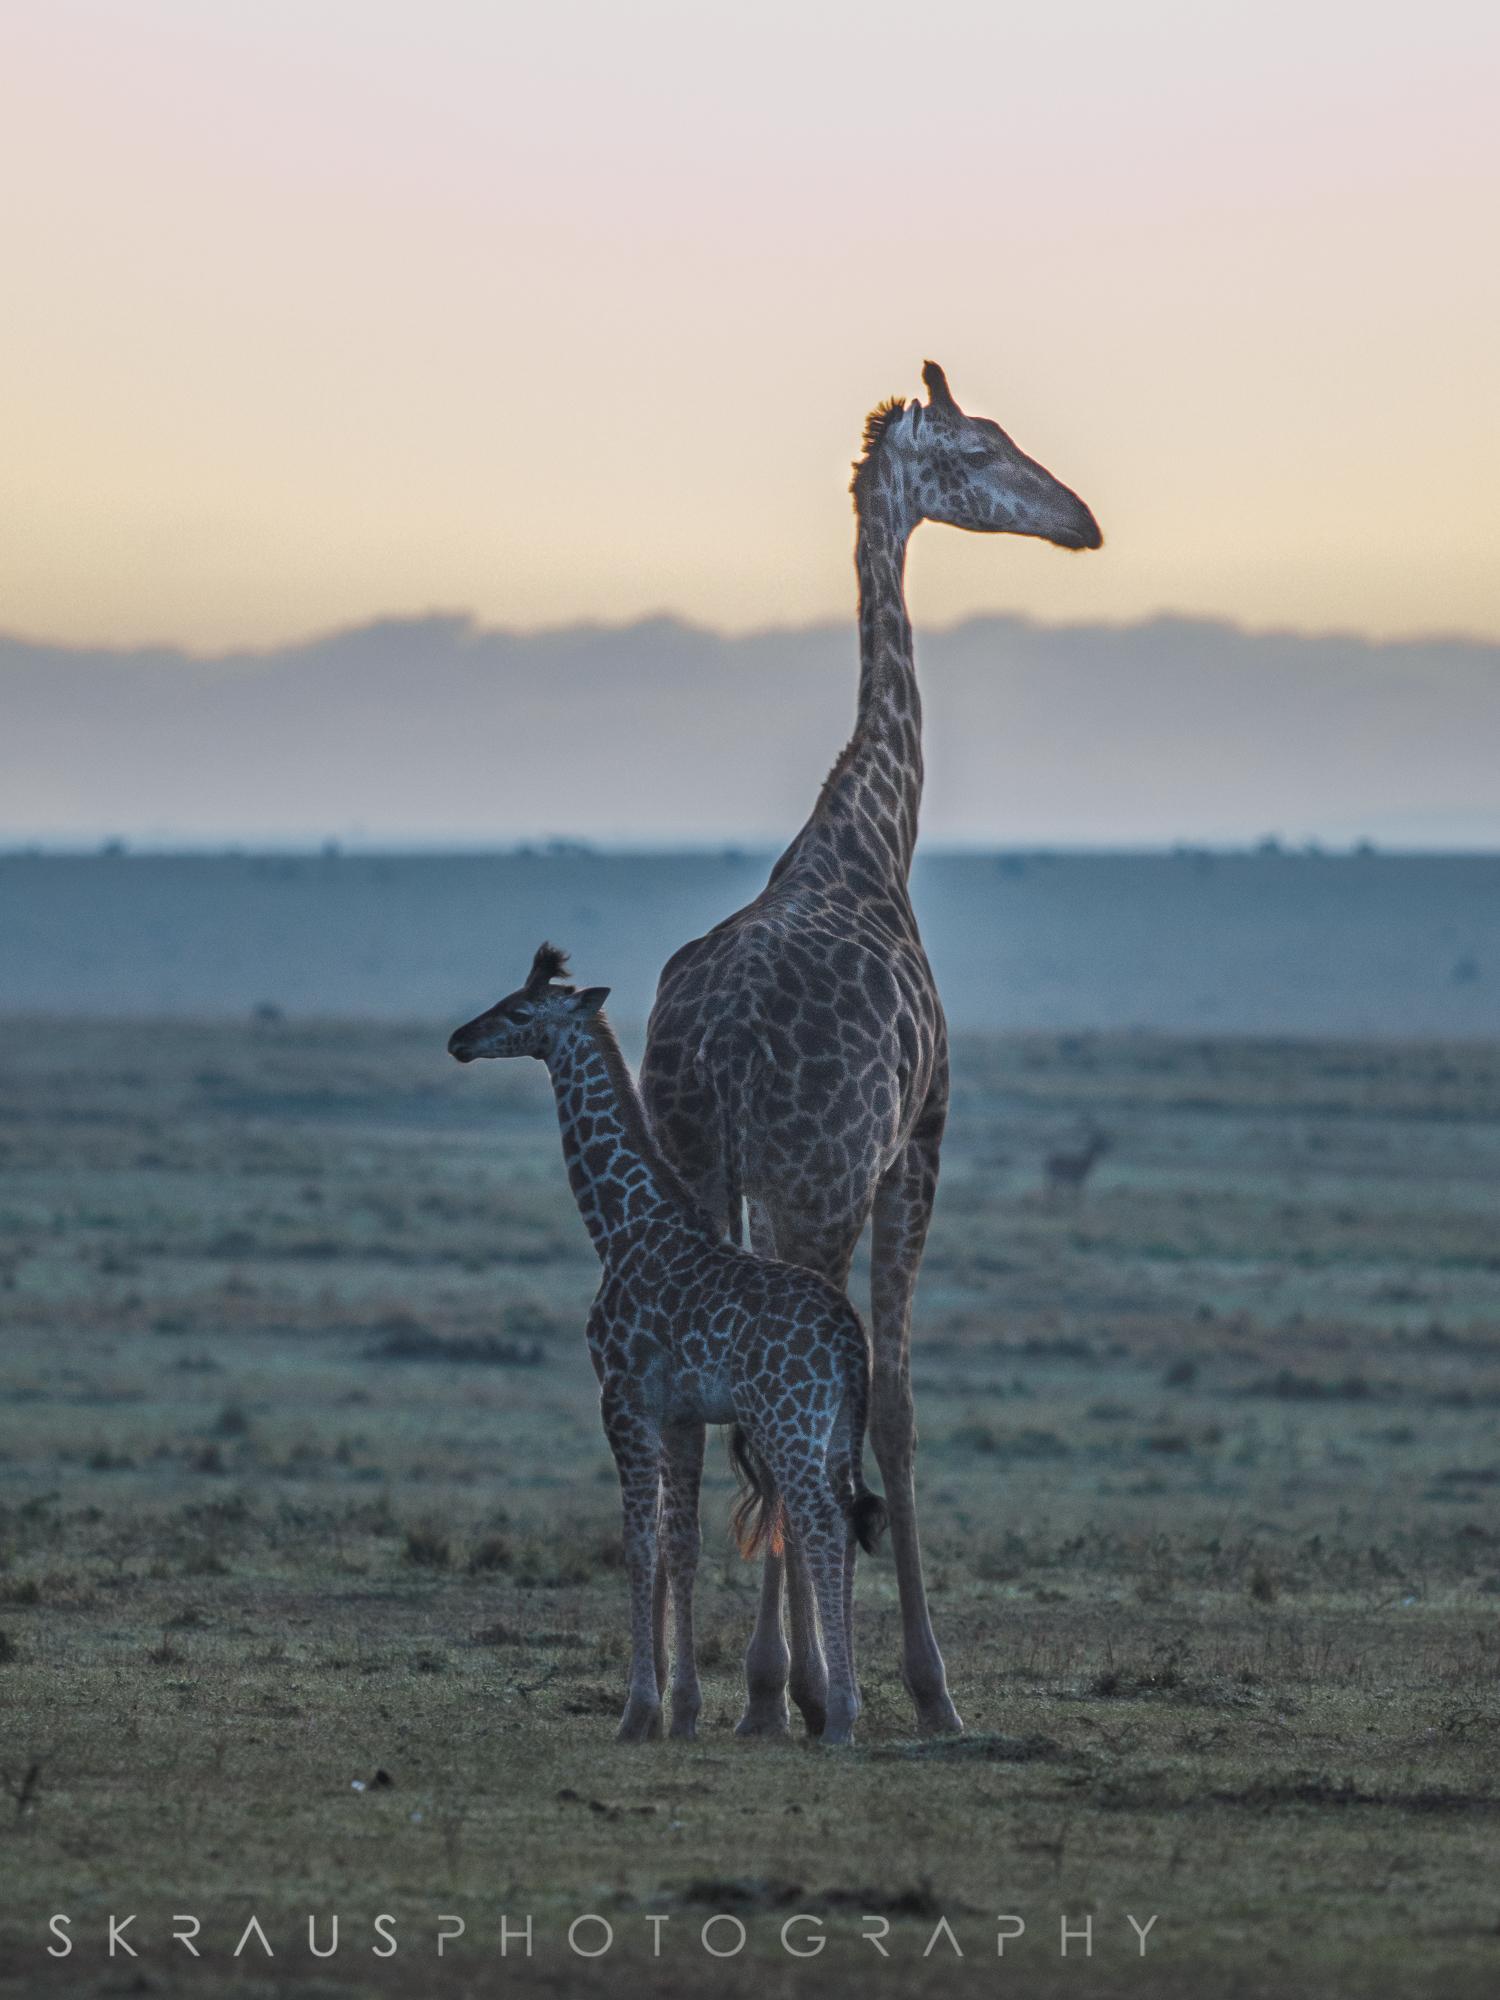 giraffe with baby.jpg